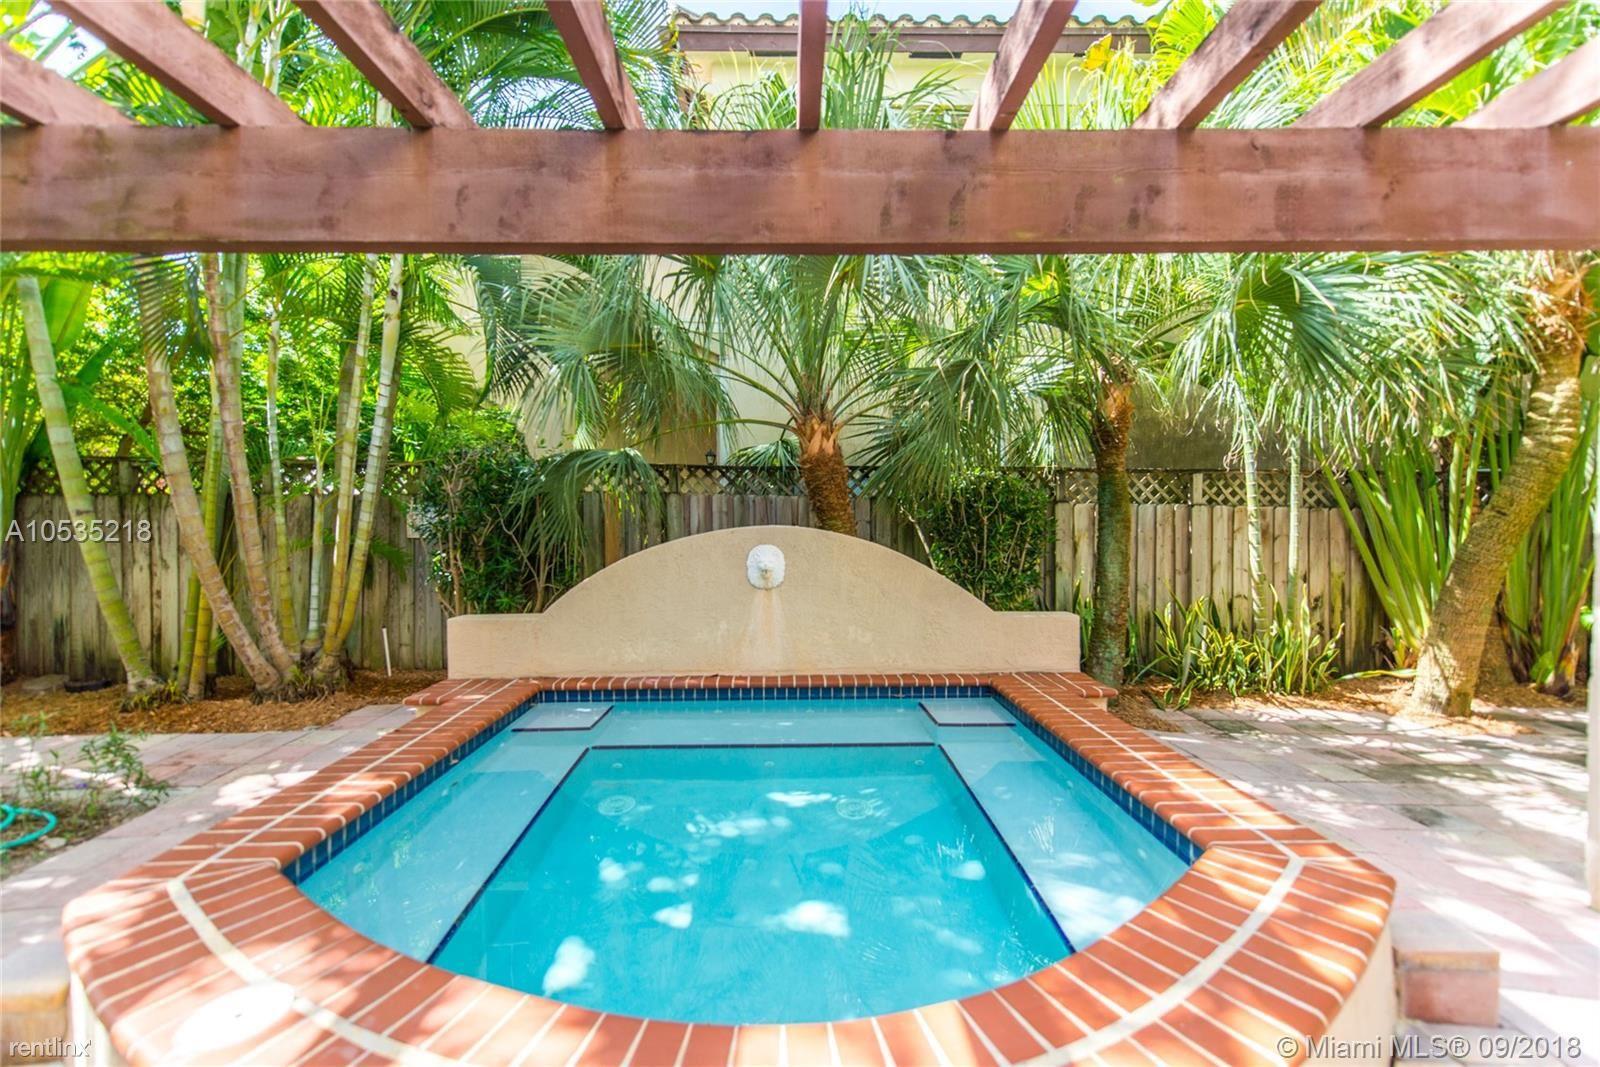 2902 Center St, Coconut Grove, FL - $2,800